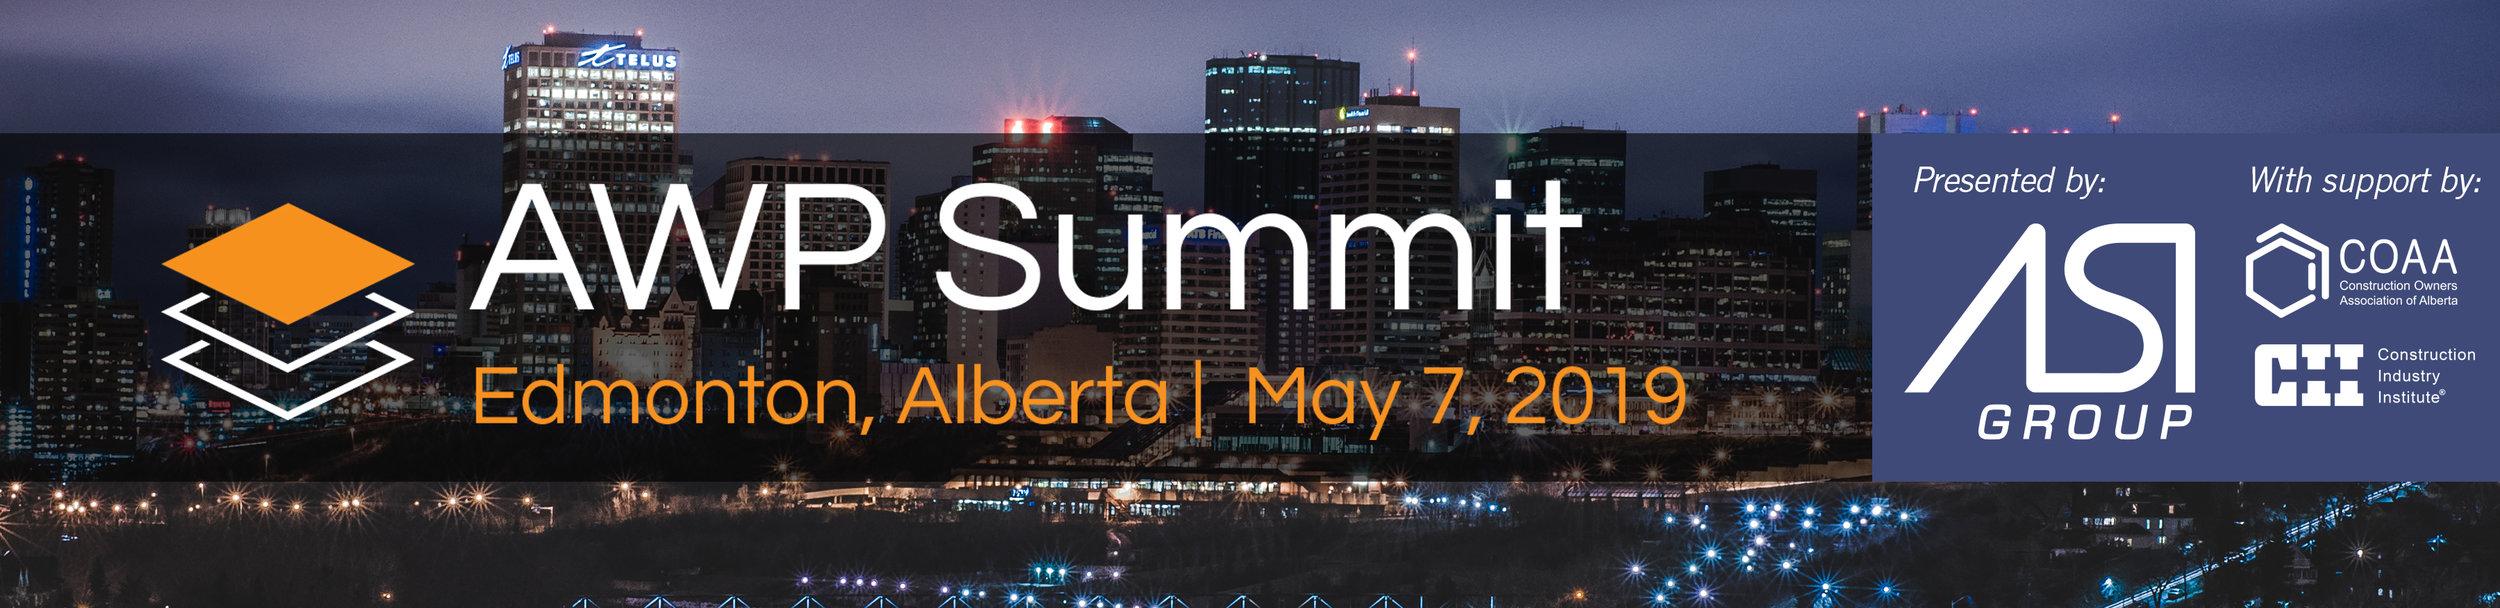 Summit Banner Wide Letter Size (2019).jpg